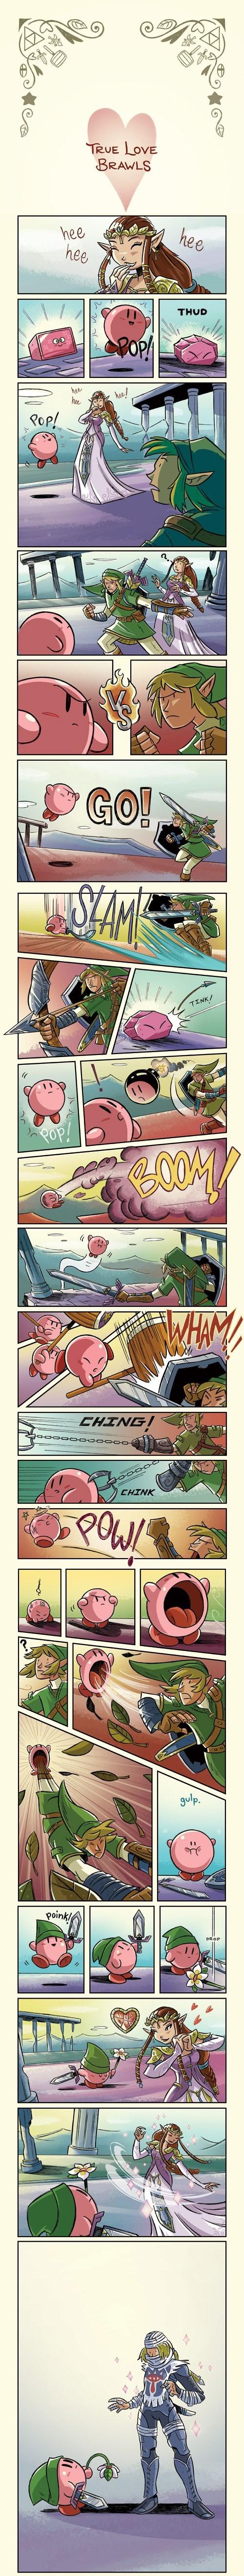 true love,super smash bros,kirby,zelda,web comics